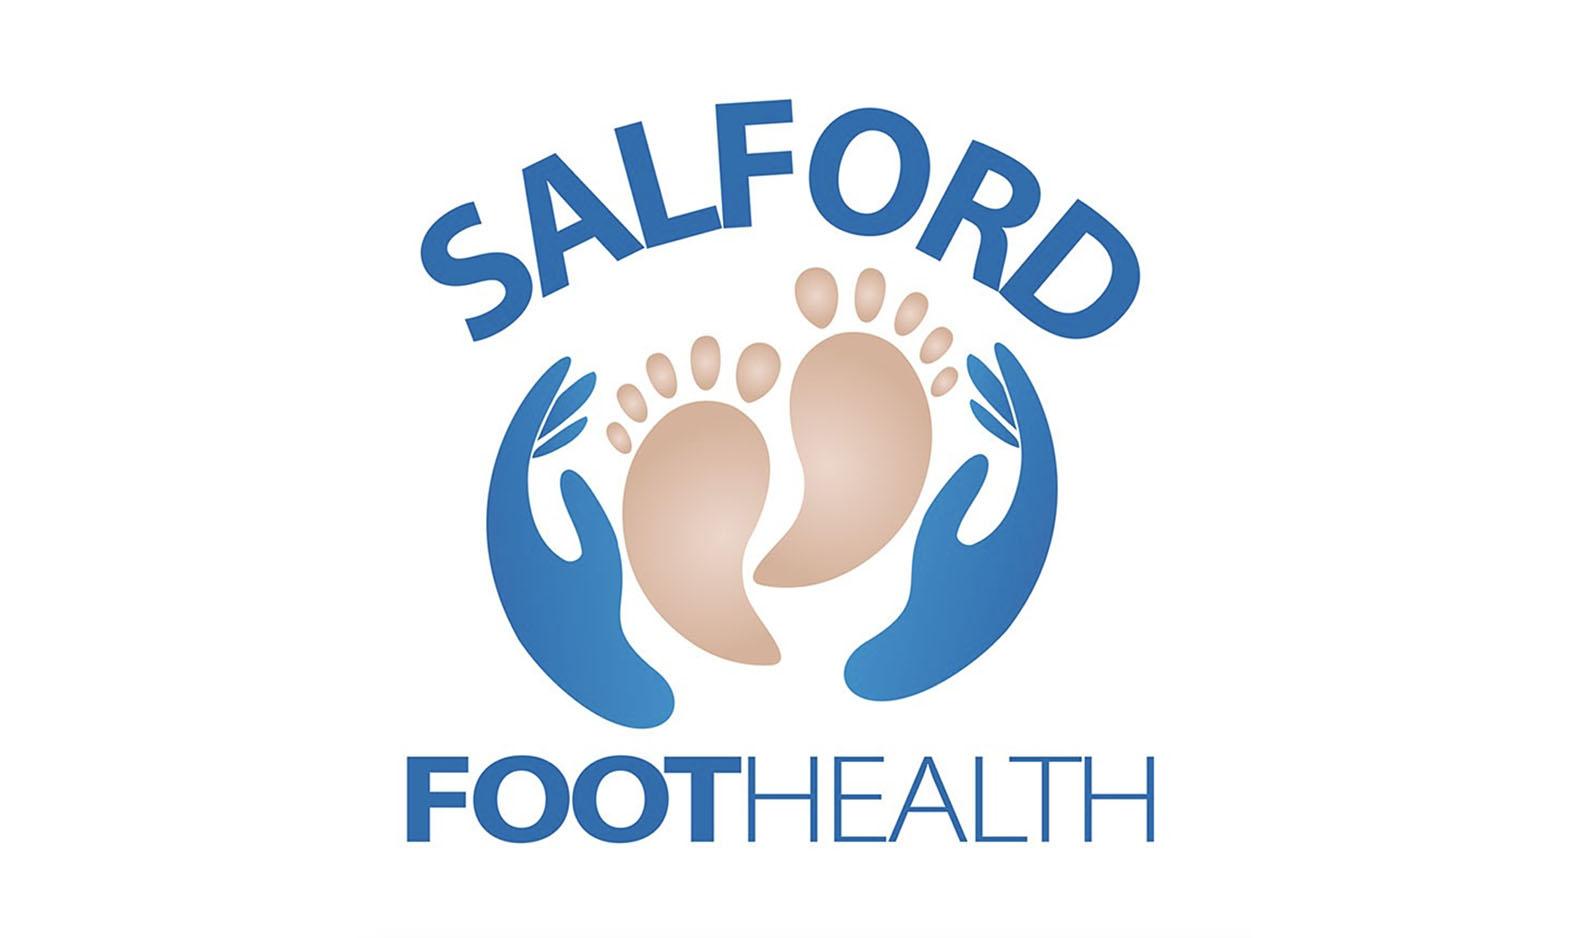 Salford Ft care Logo